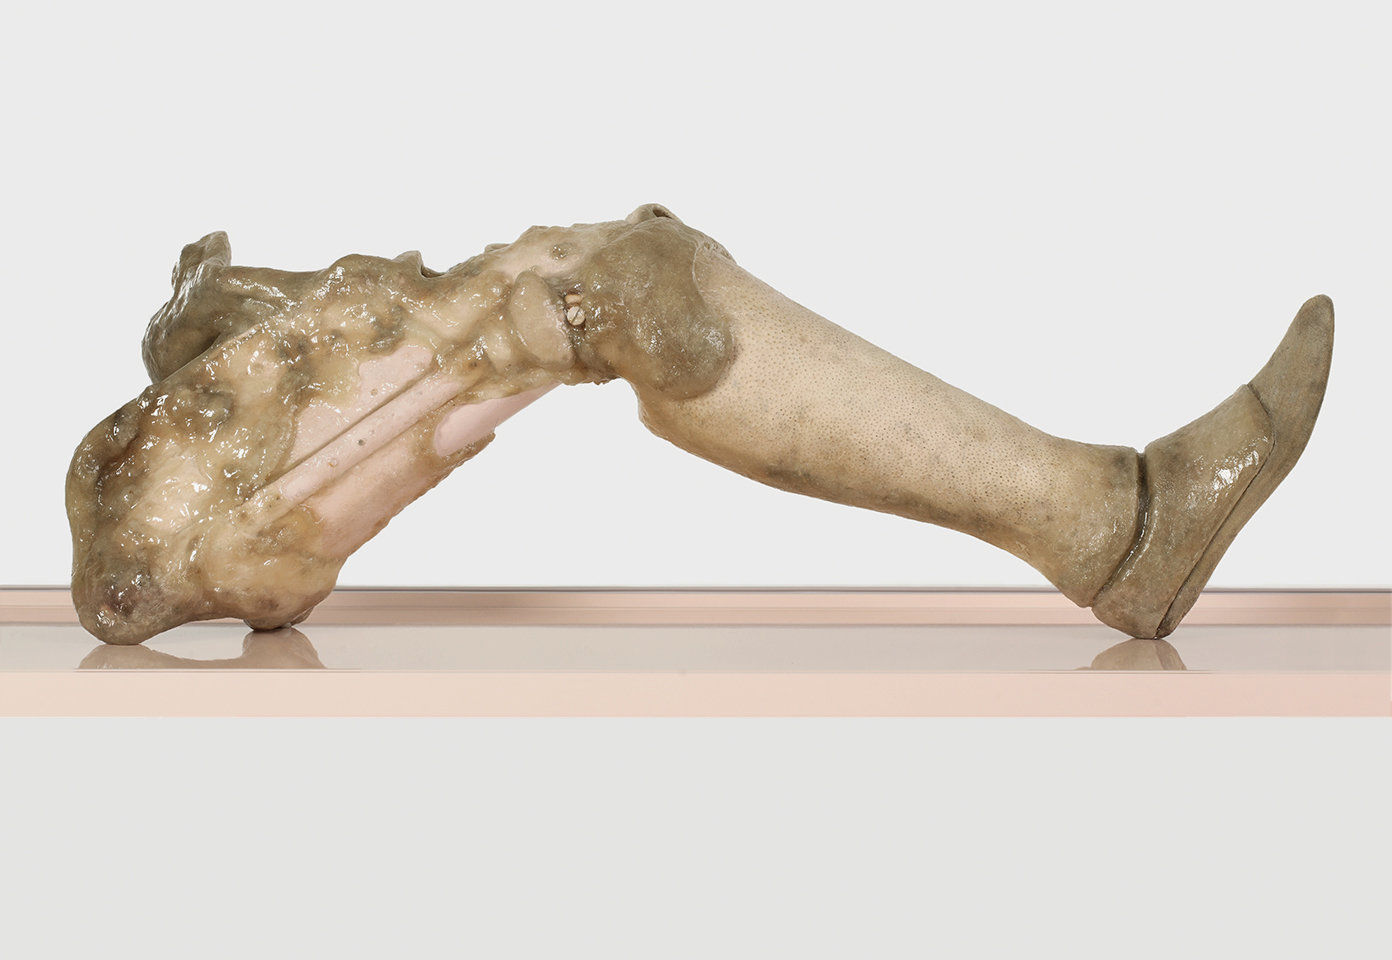 ONANIA / Aetiology Unknown 18 (detail) / 2012 / 160 x 50 x 120 cm / prosthesis, fat, leather, cosmetics, polyvinyl acetate, vitrine